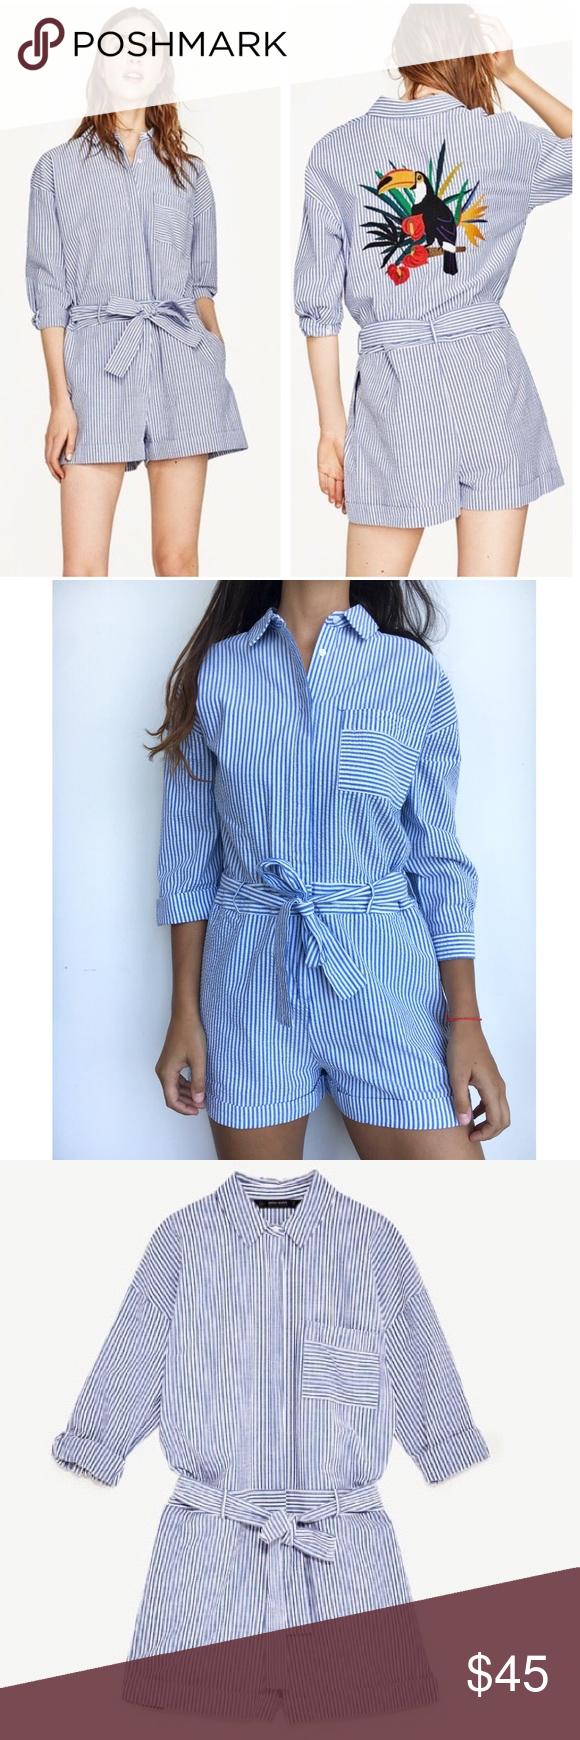 63de1a956d08 Zara blue white striped toucan short jumpsuit M Amazing romper slash short  jumpsuit in seersucker blue